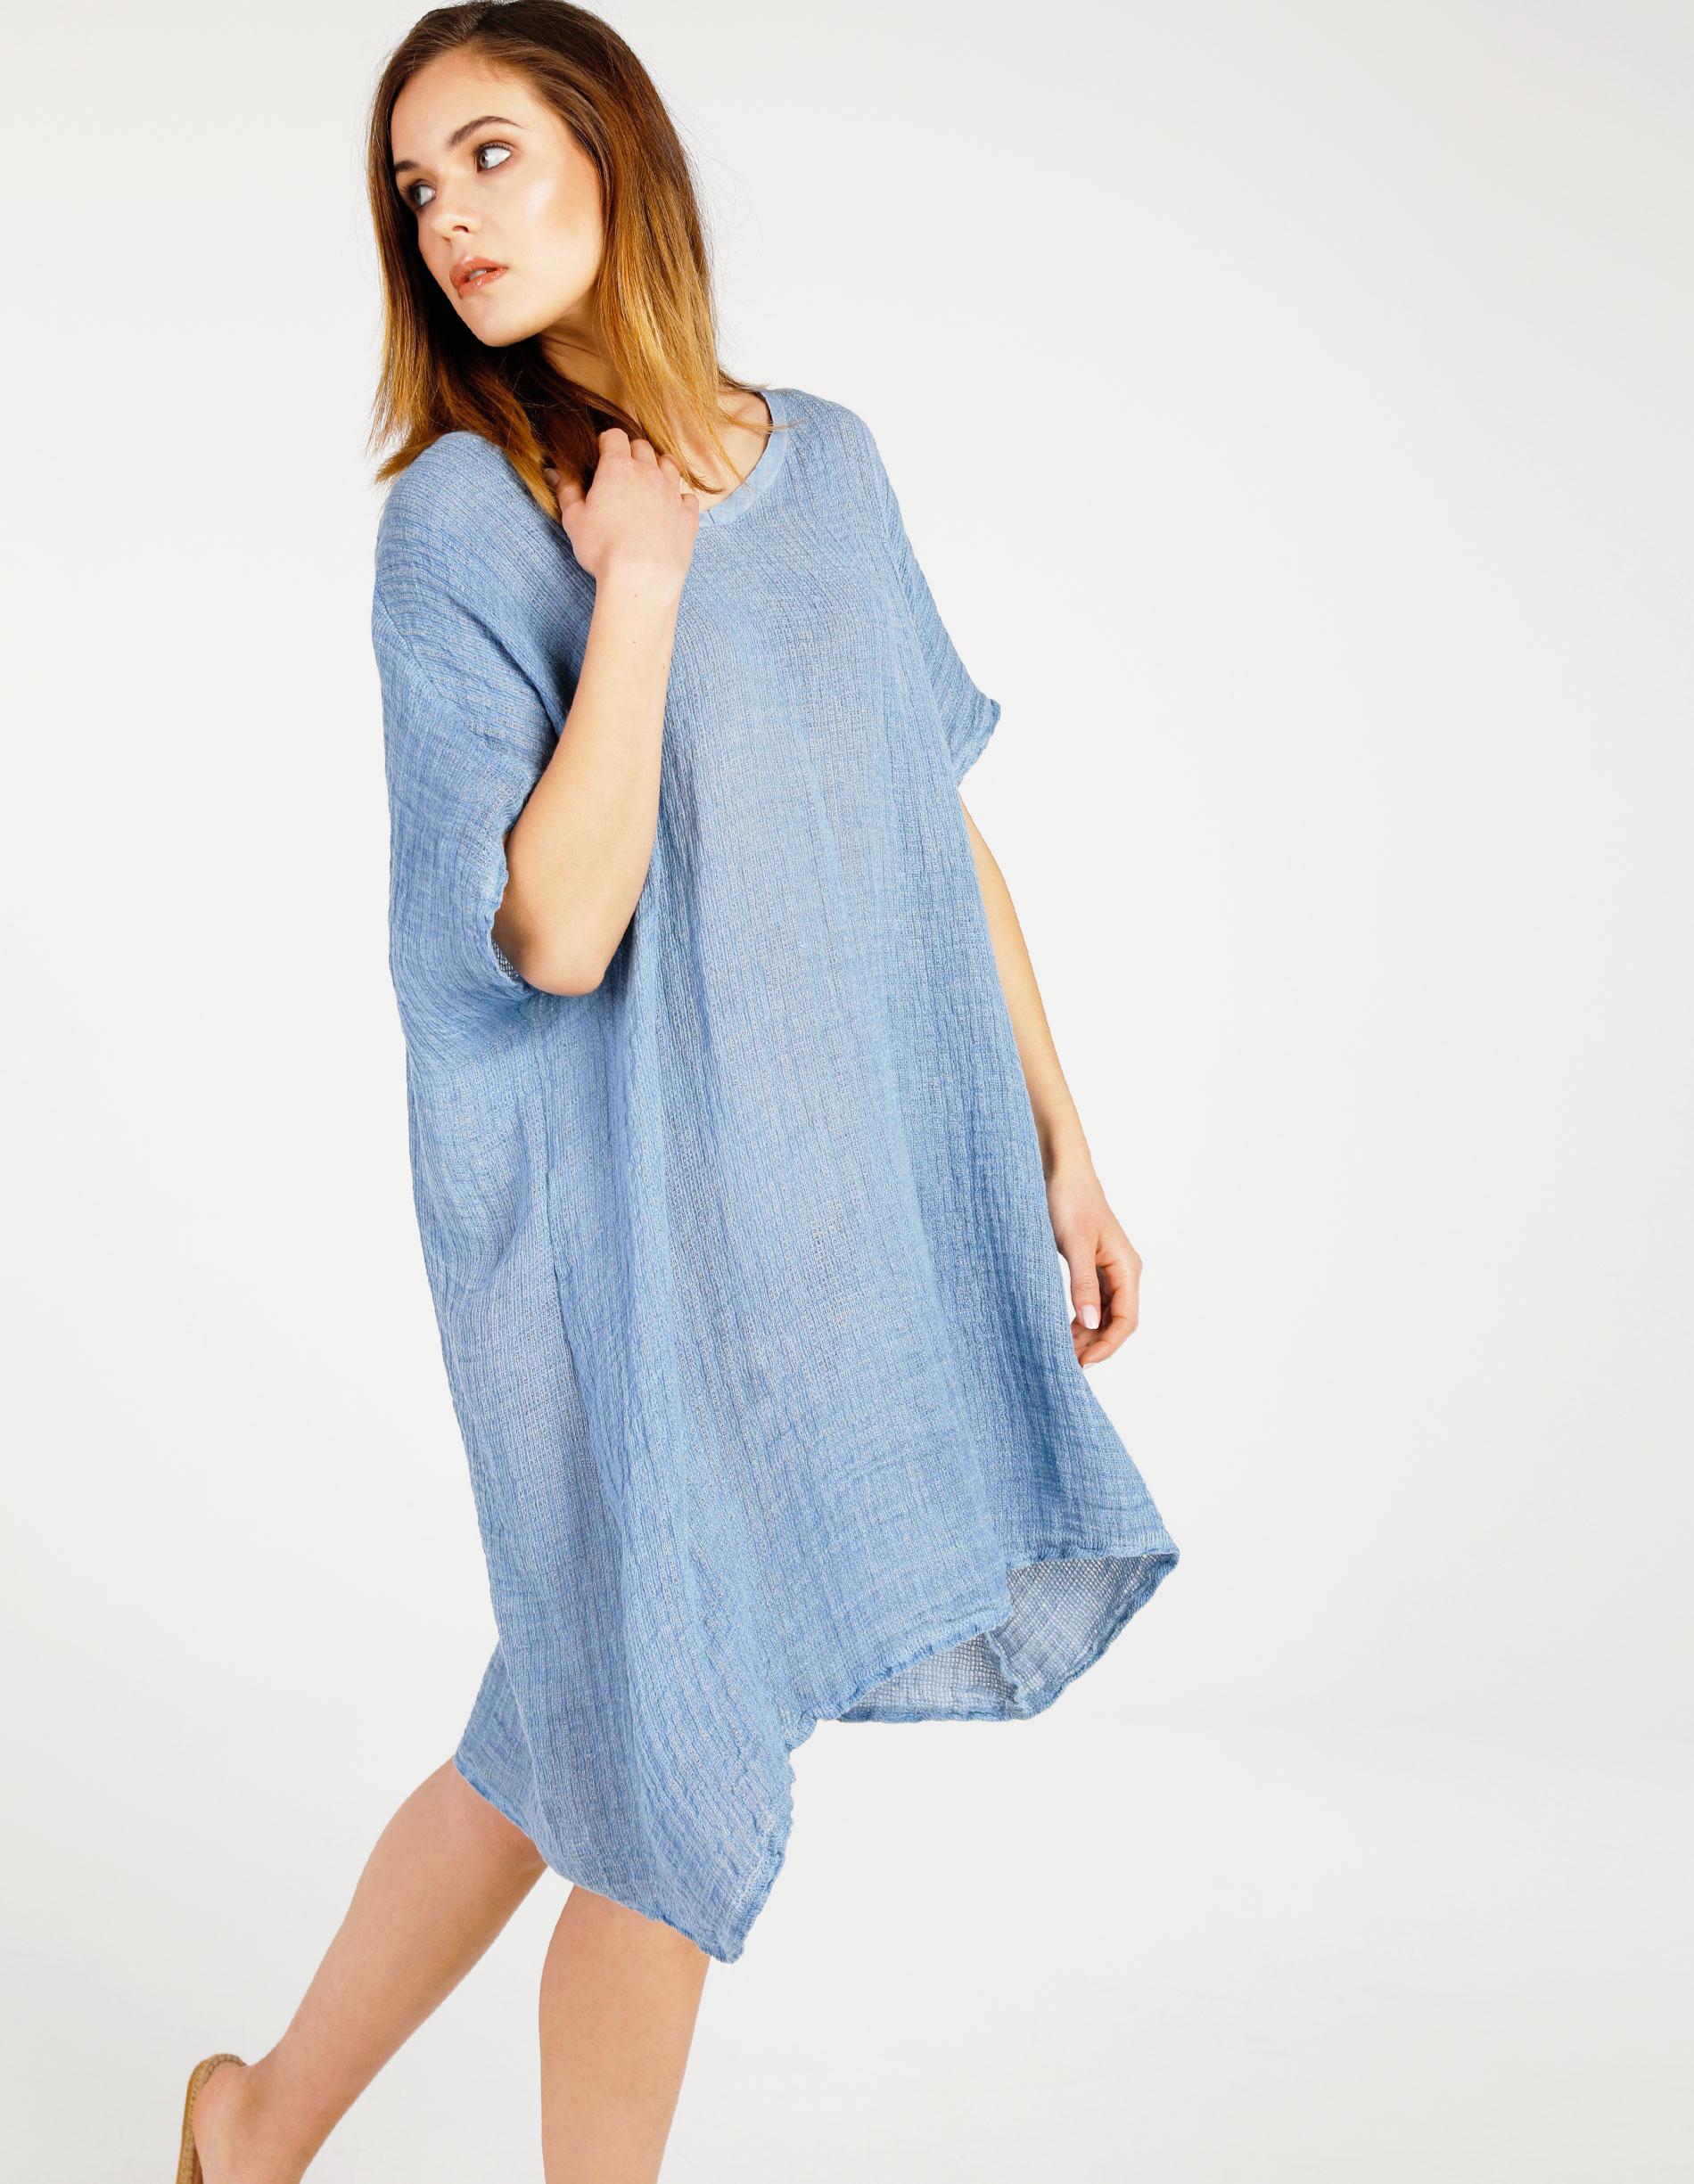 Sukienka - 16-3860 JEANS - Unisono